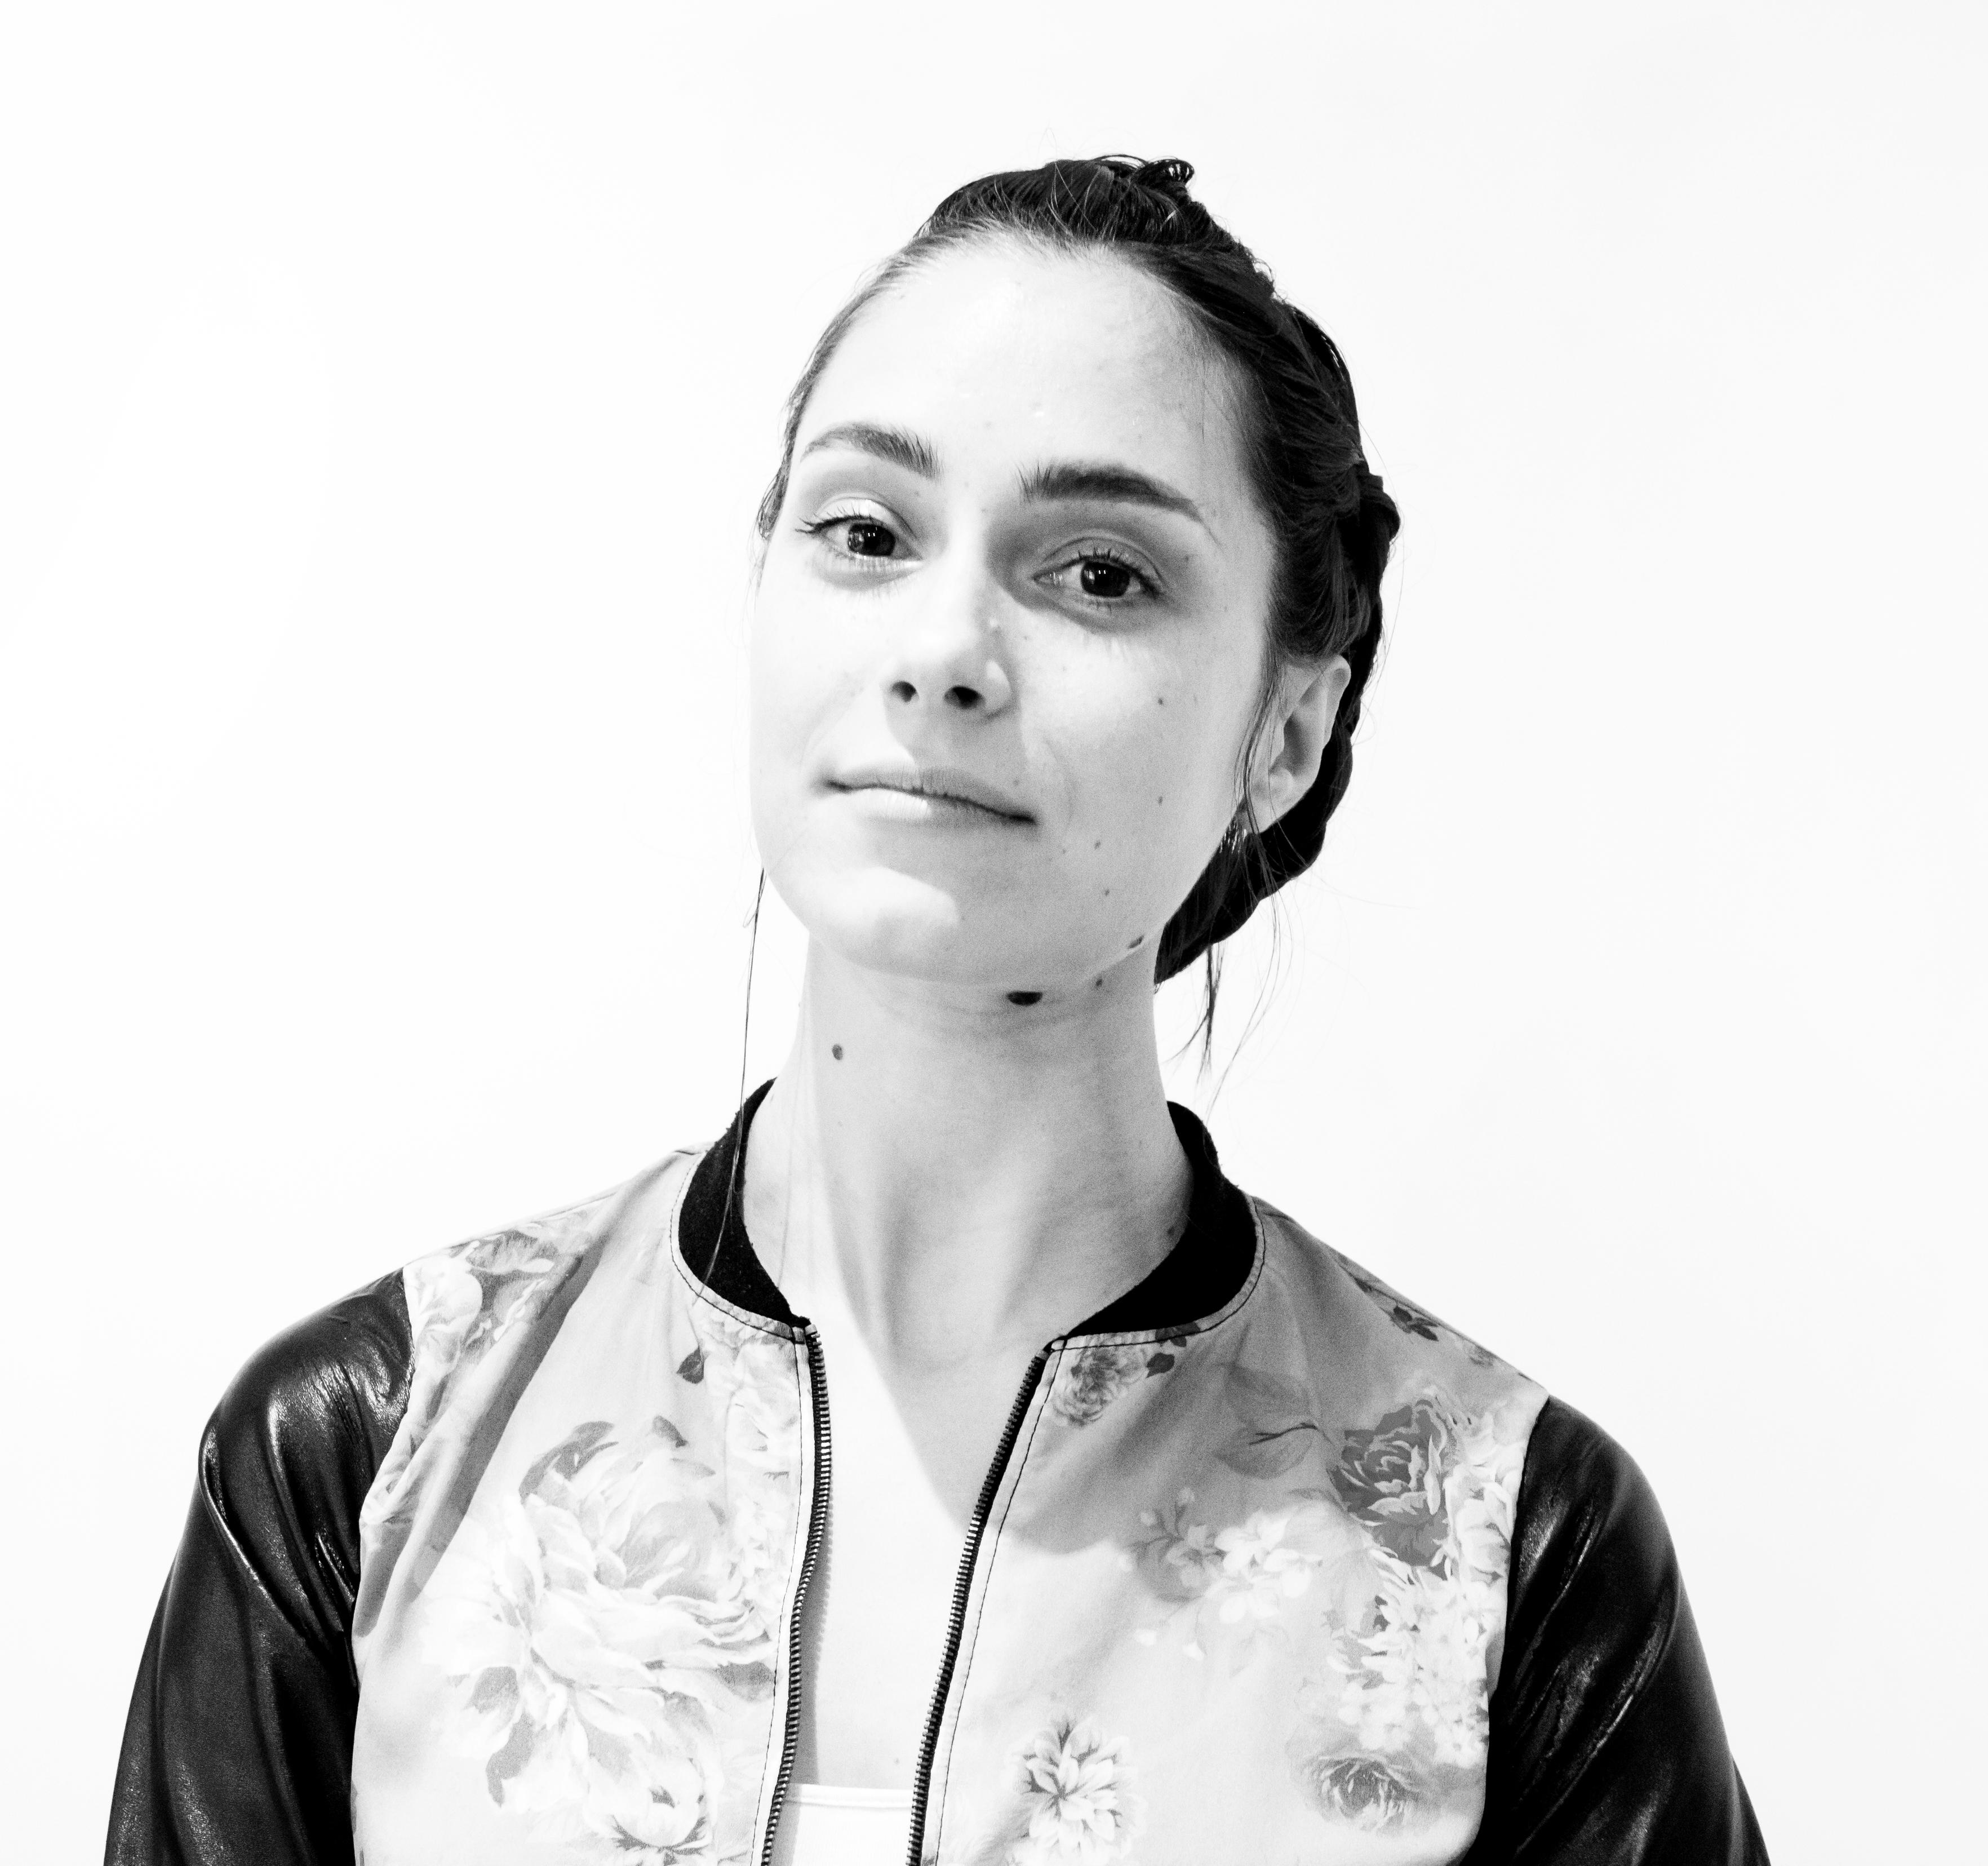 ANNE VERHAGUE